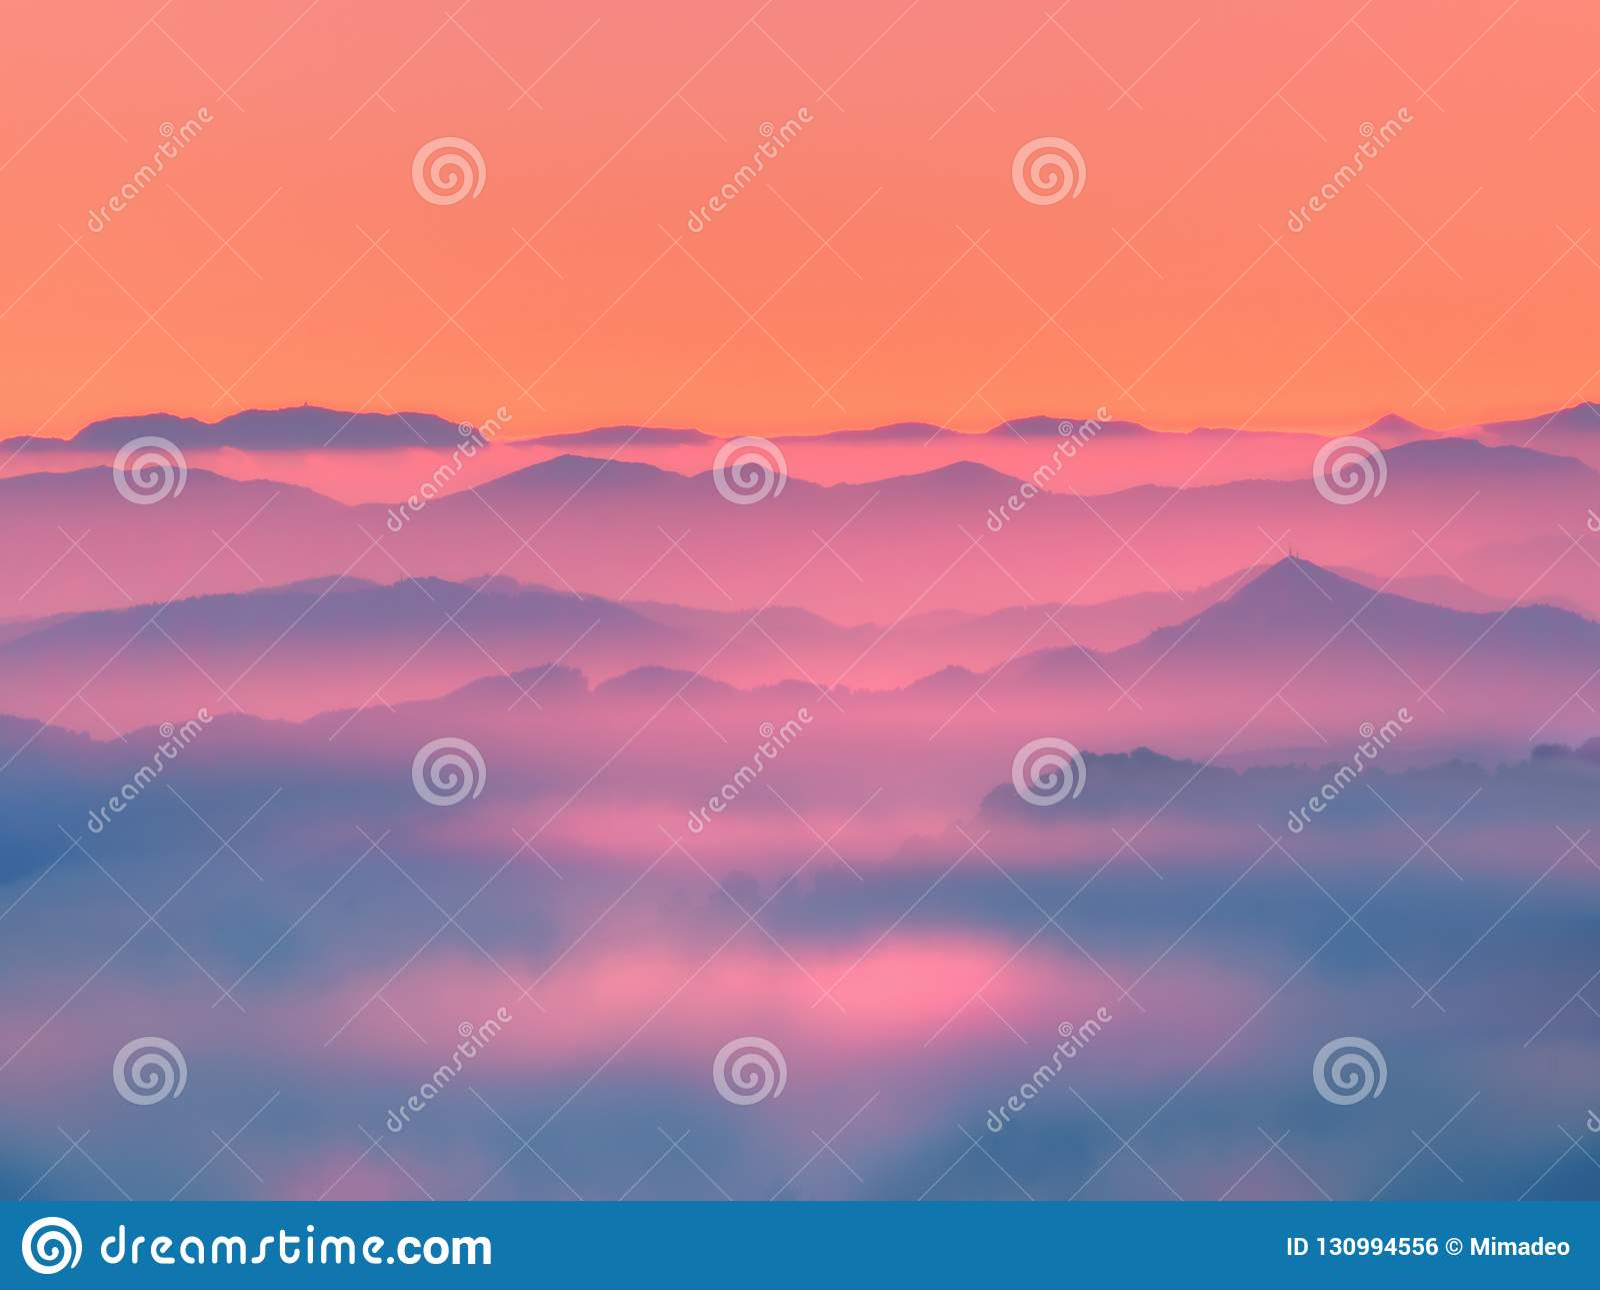 Misty mountains silhouettes